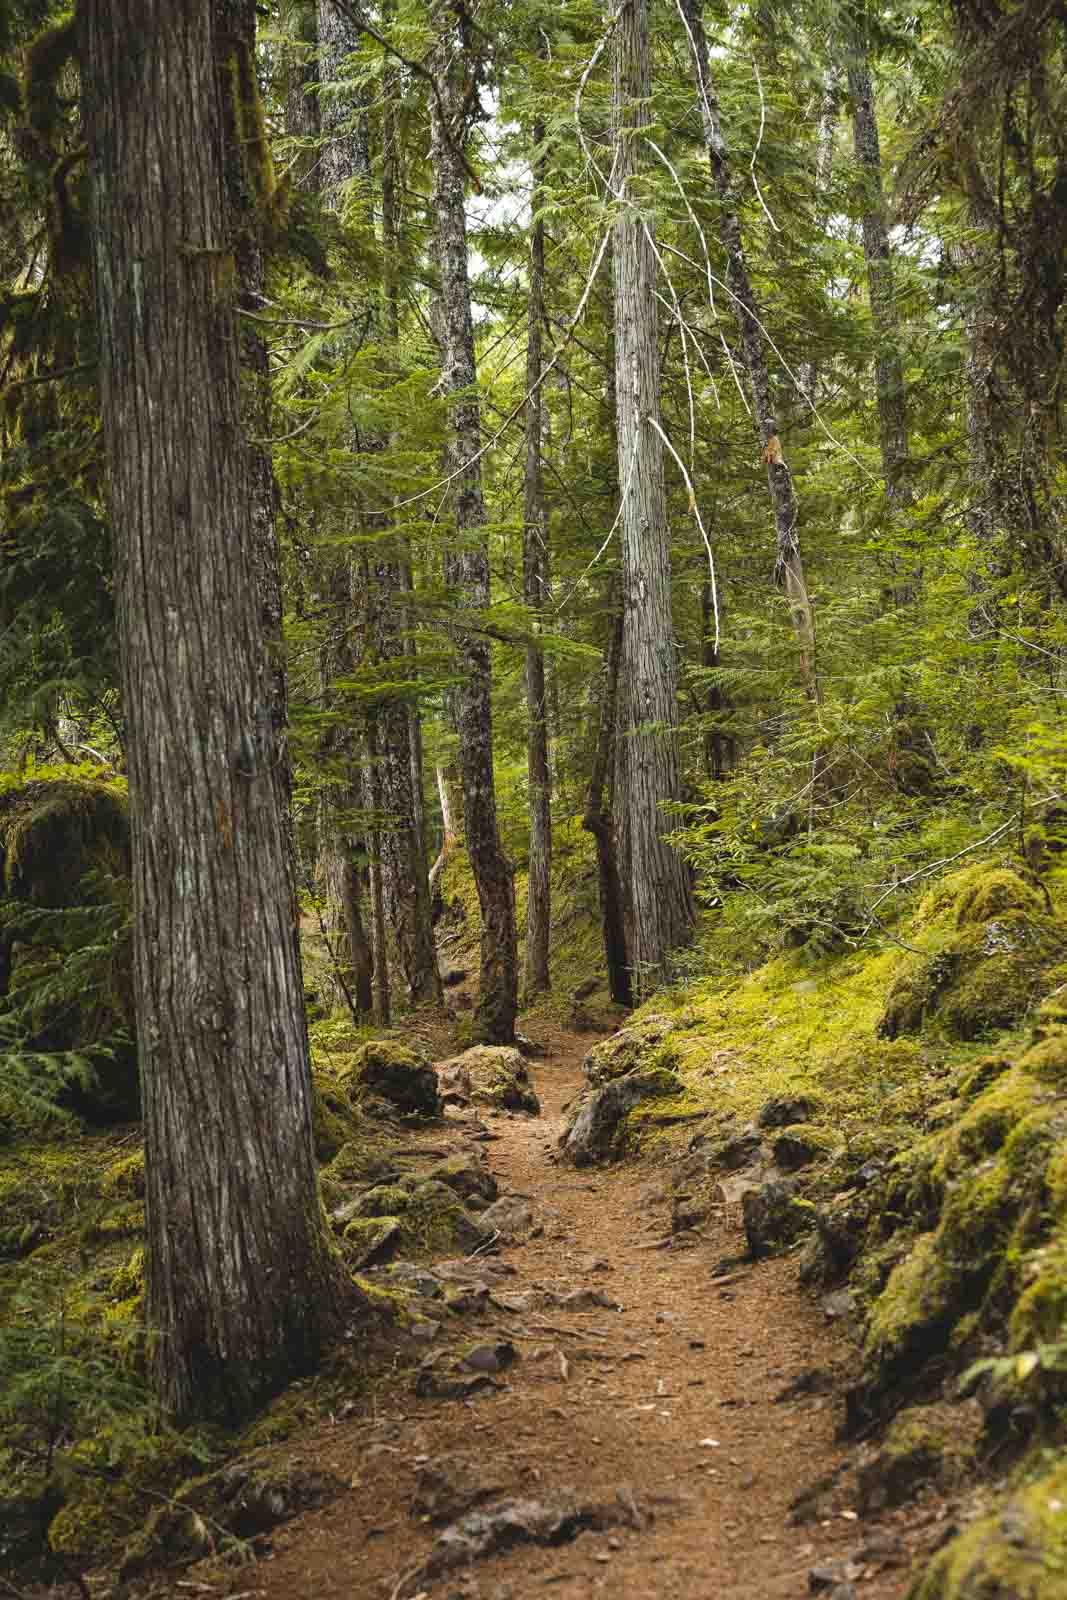 Trail in the woods leading to Koosah Falls